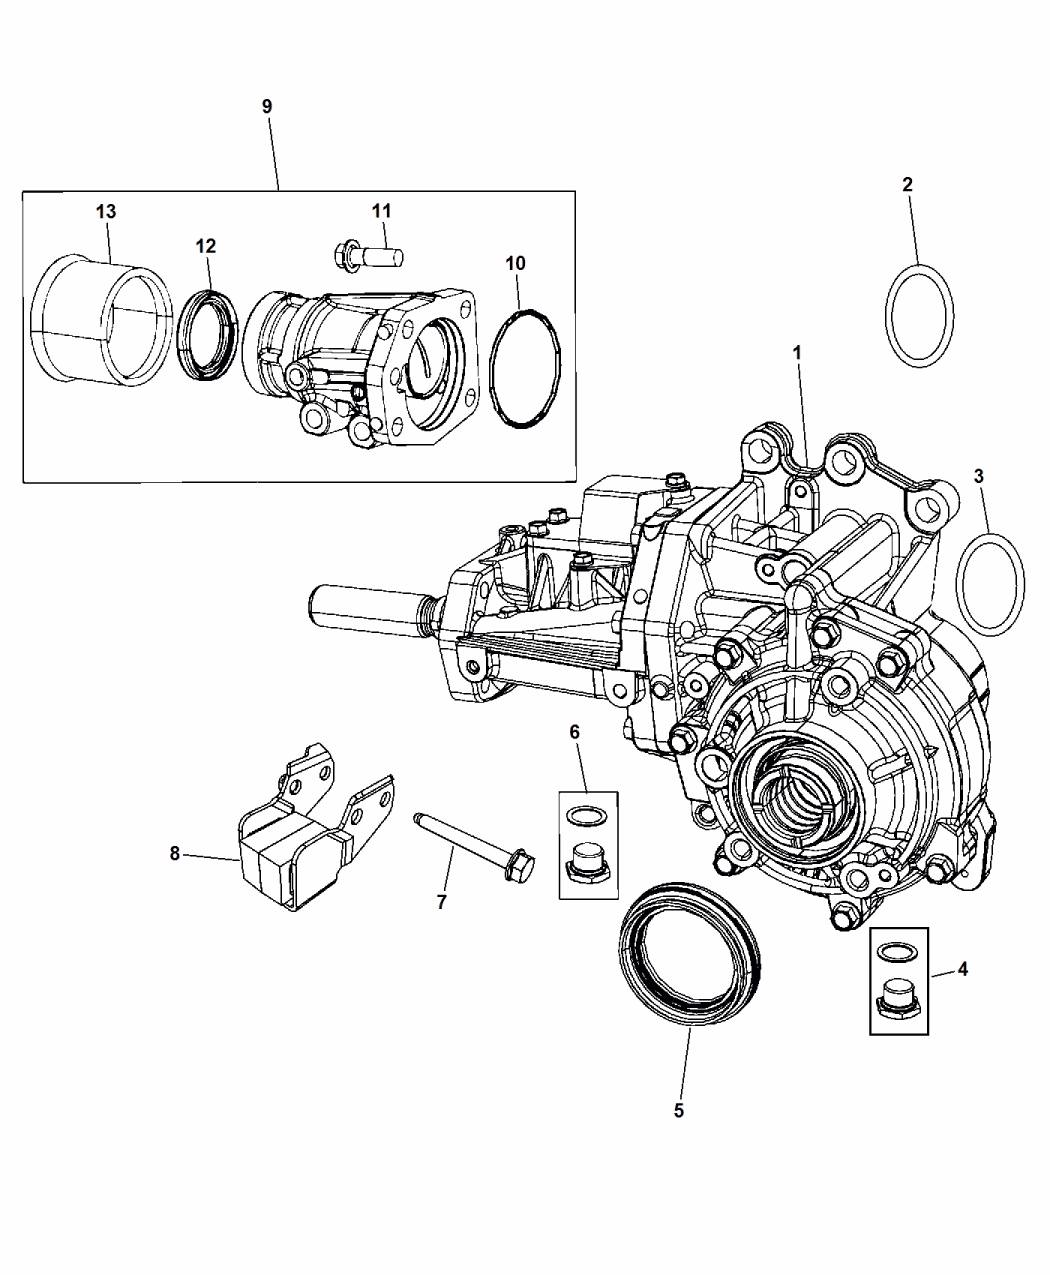 2012 Jeep Compass Engine Diagram Jeep Liberty Wire Harness Tda2050 Yenpancane Jeanjaures37 Fr